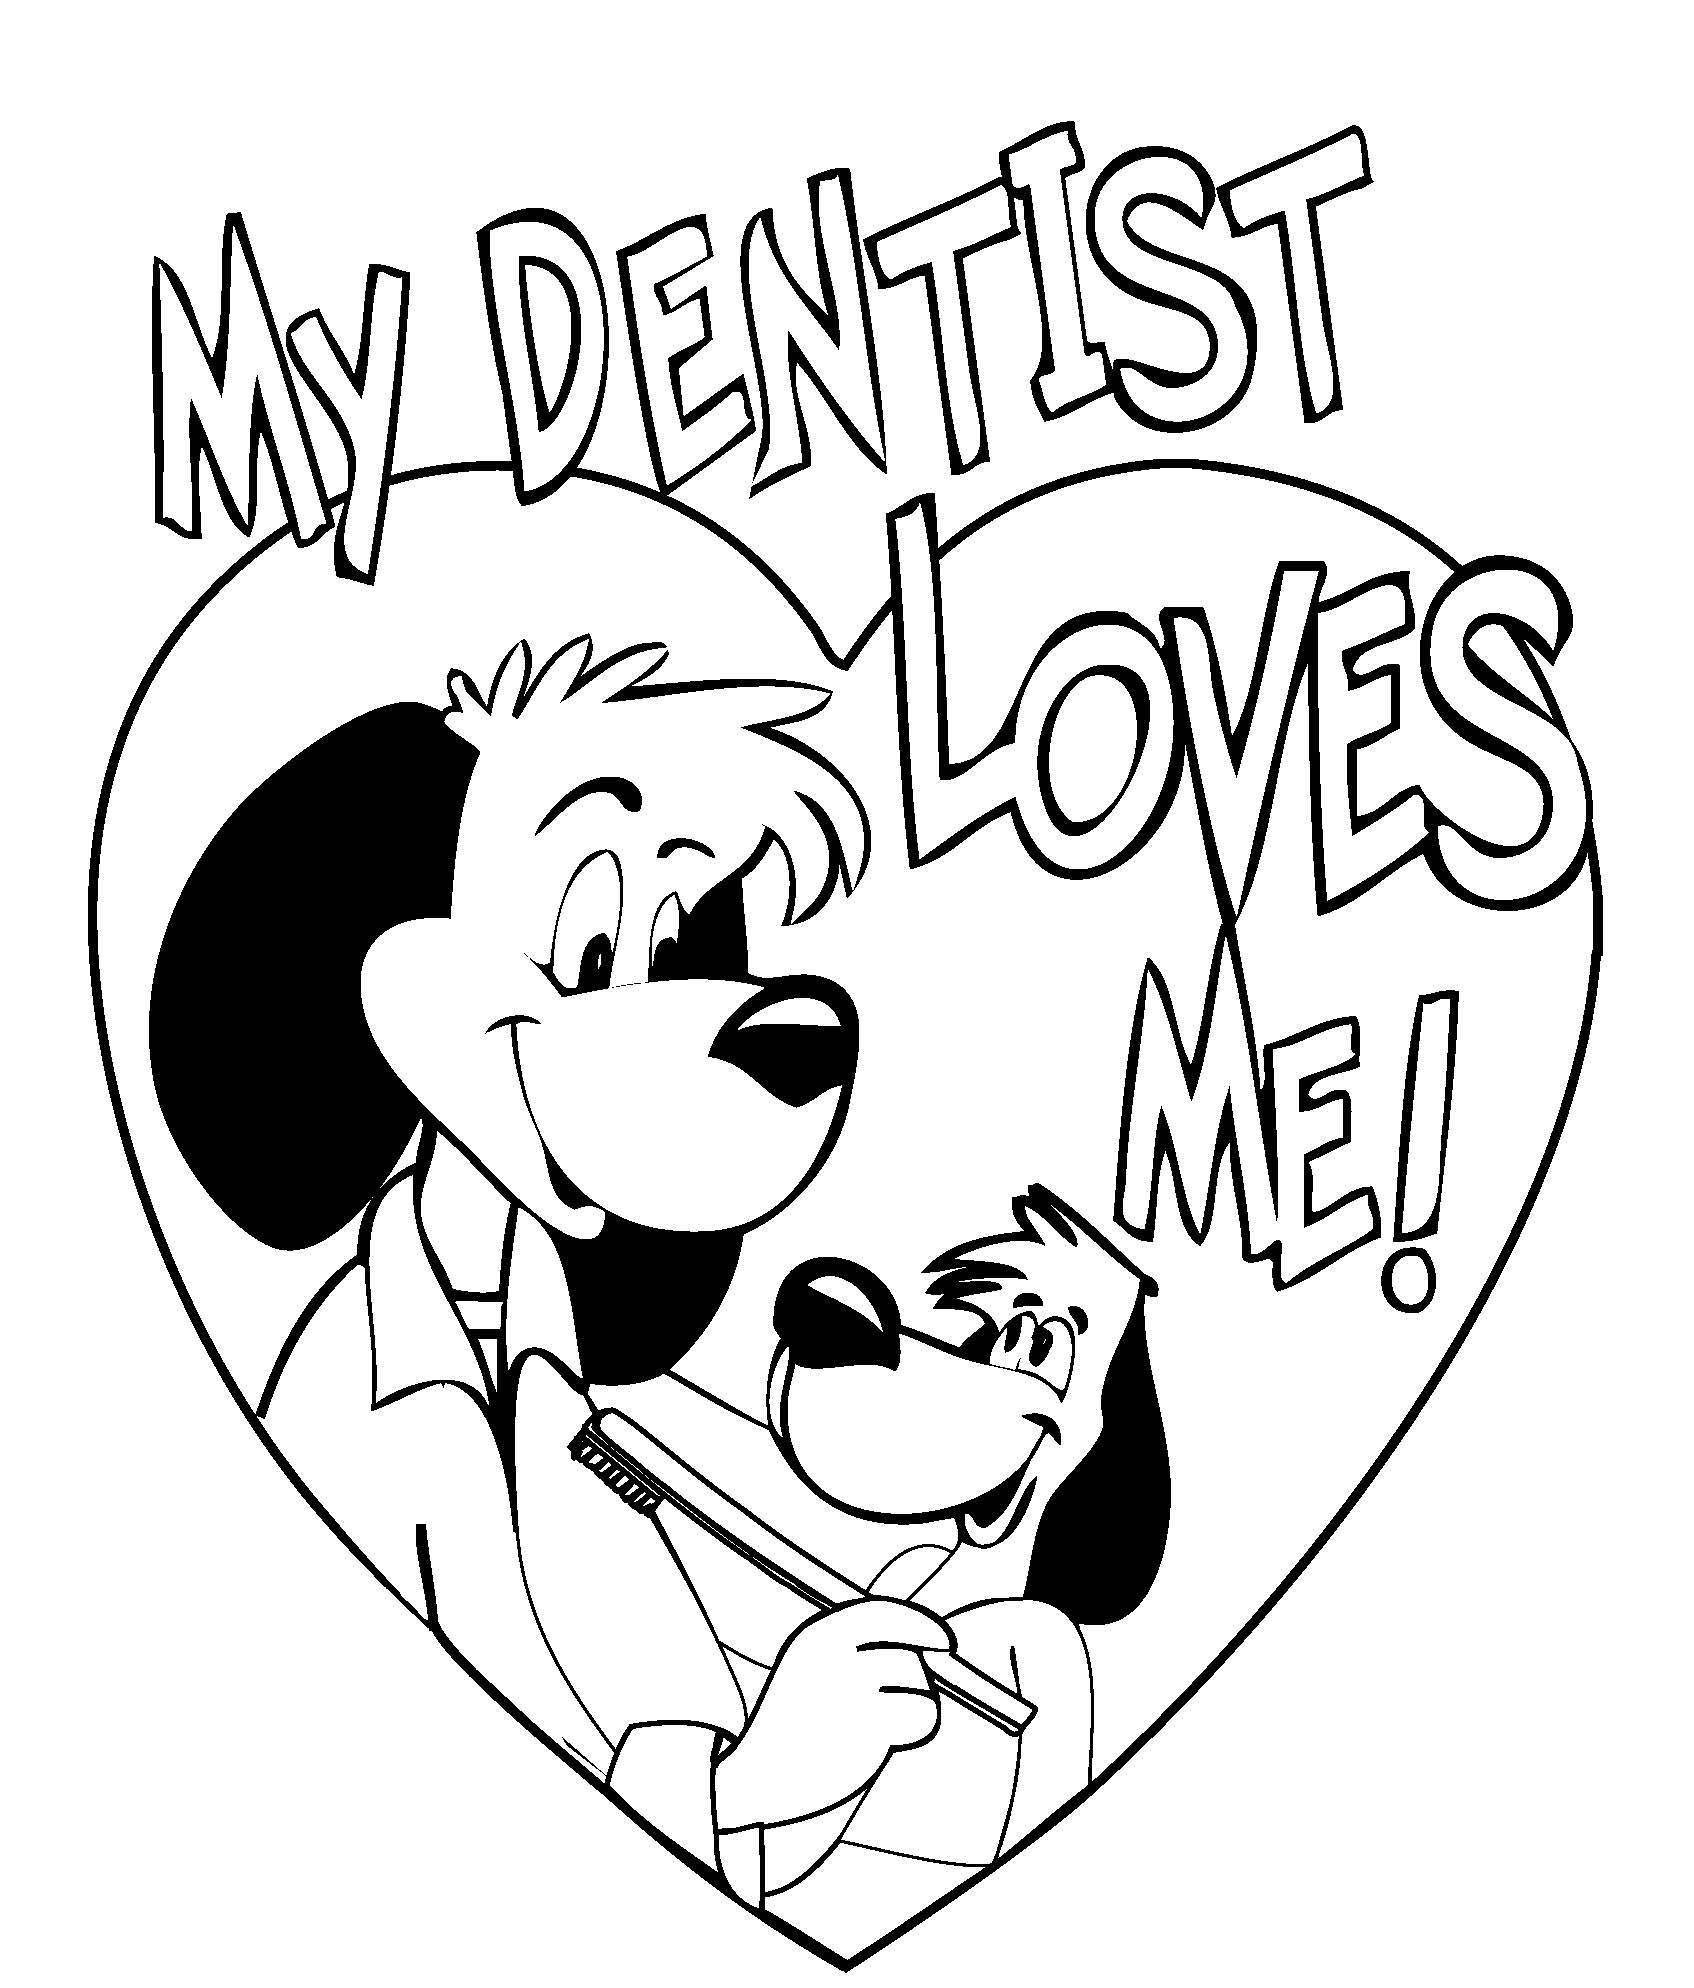 1694x1988 Unique Dentist Coloring Page Design Printable Coloring Sheet